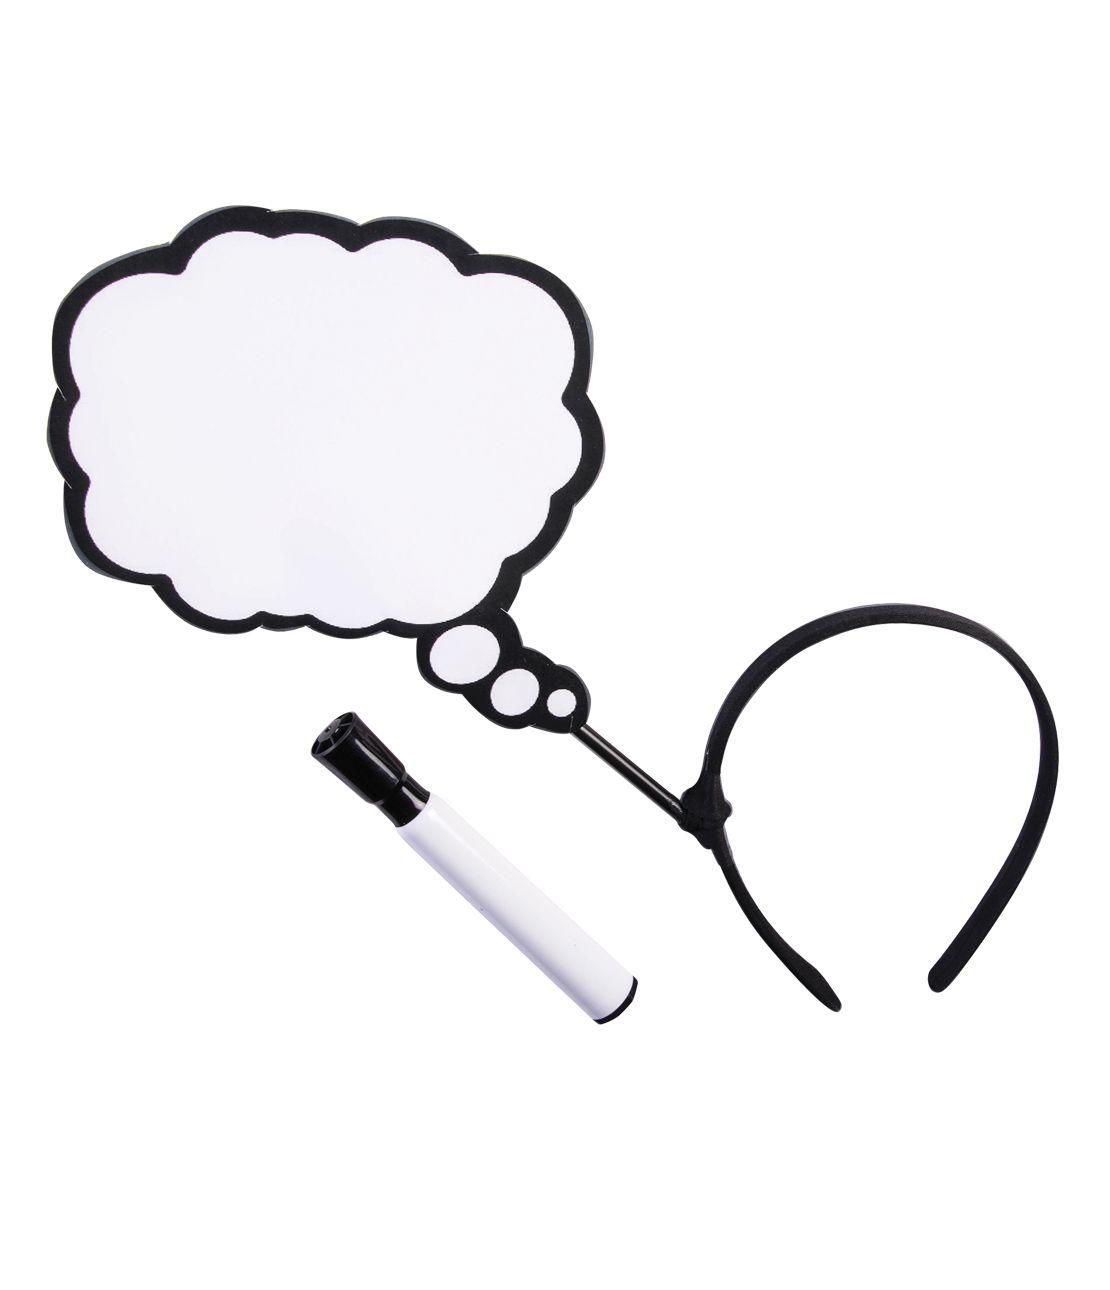 Bubble board Headband